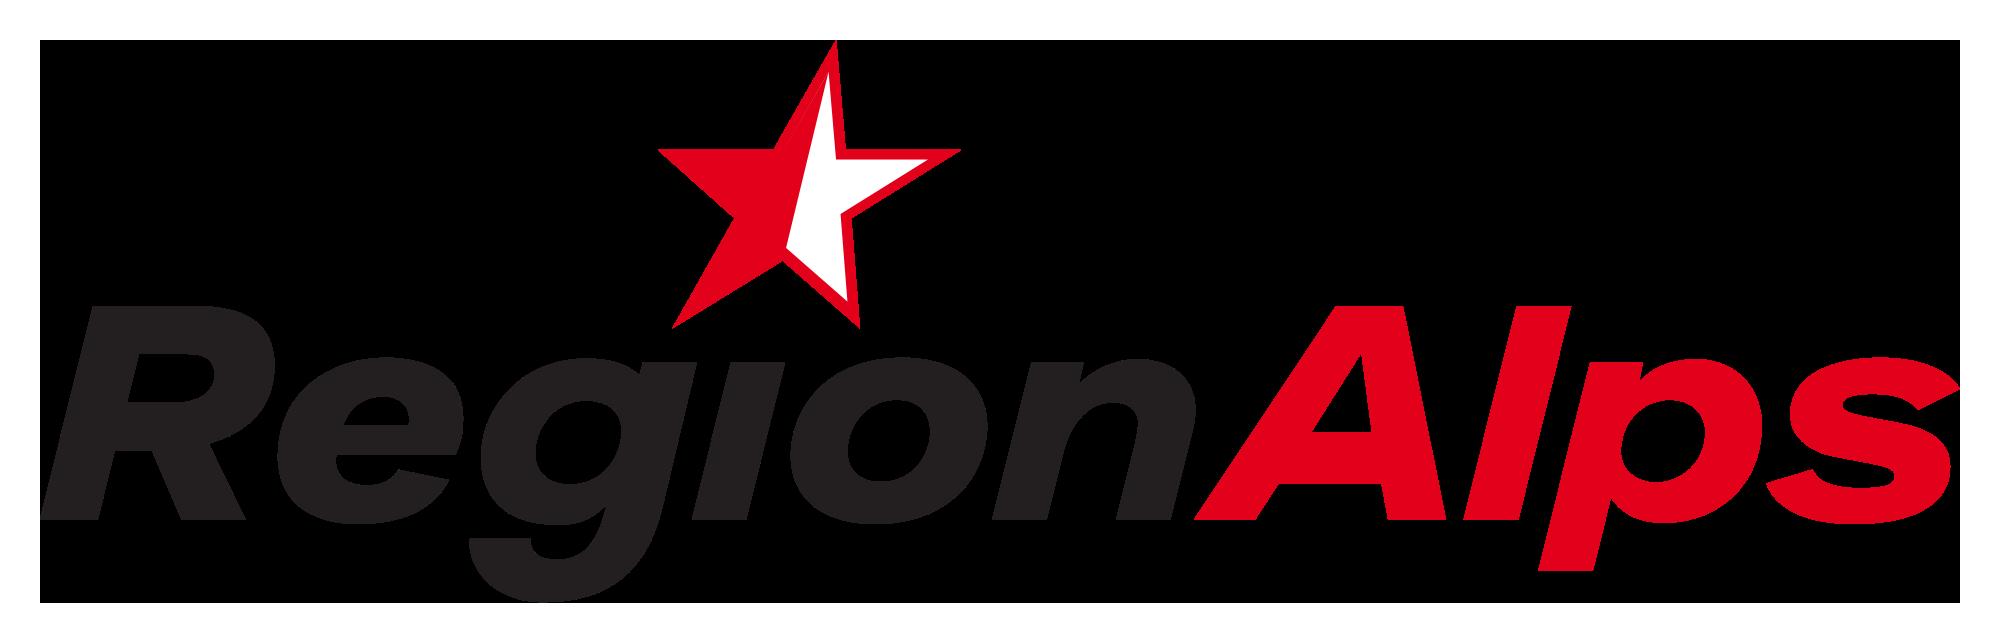 Logo Regionalps